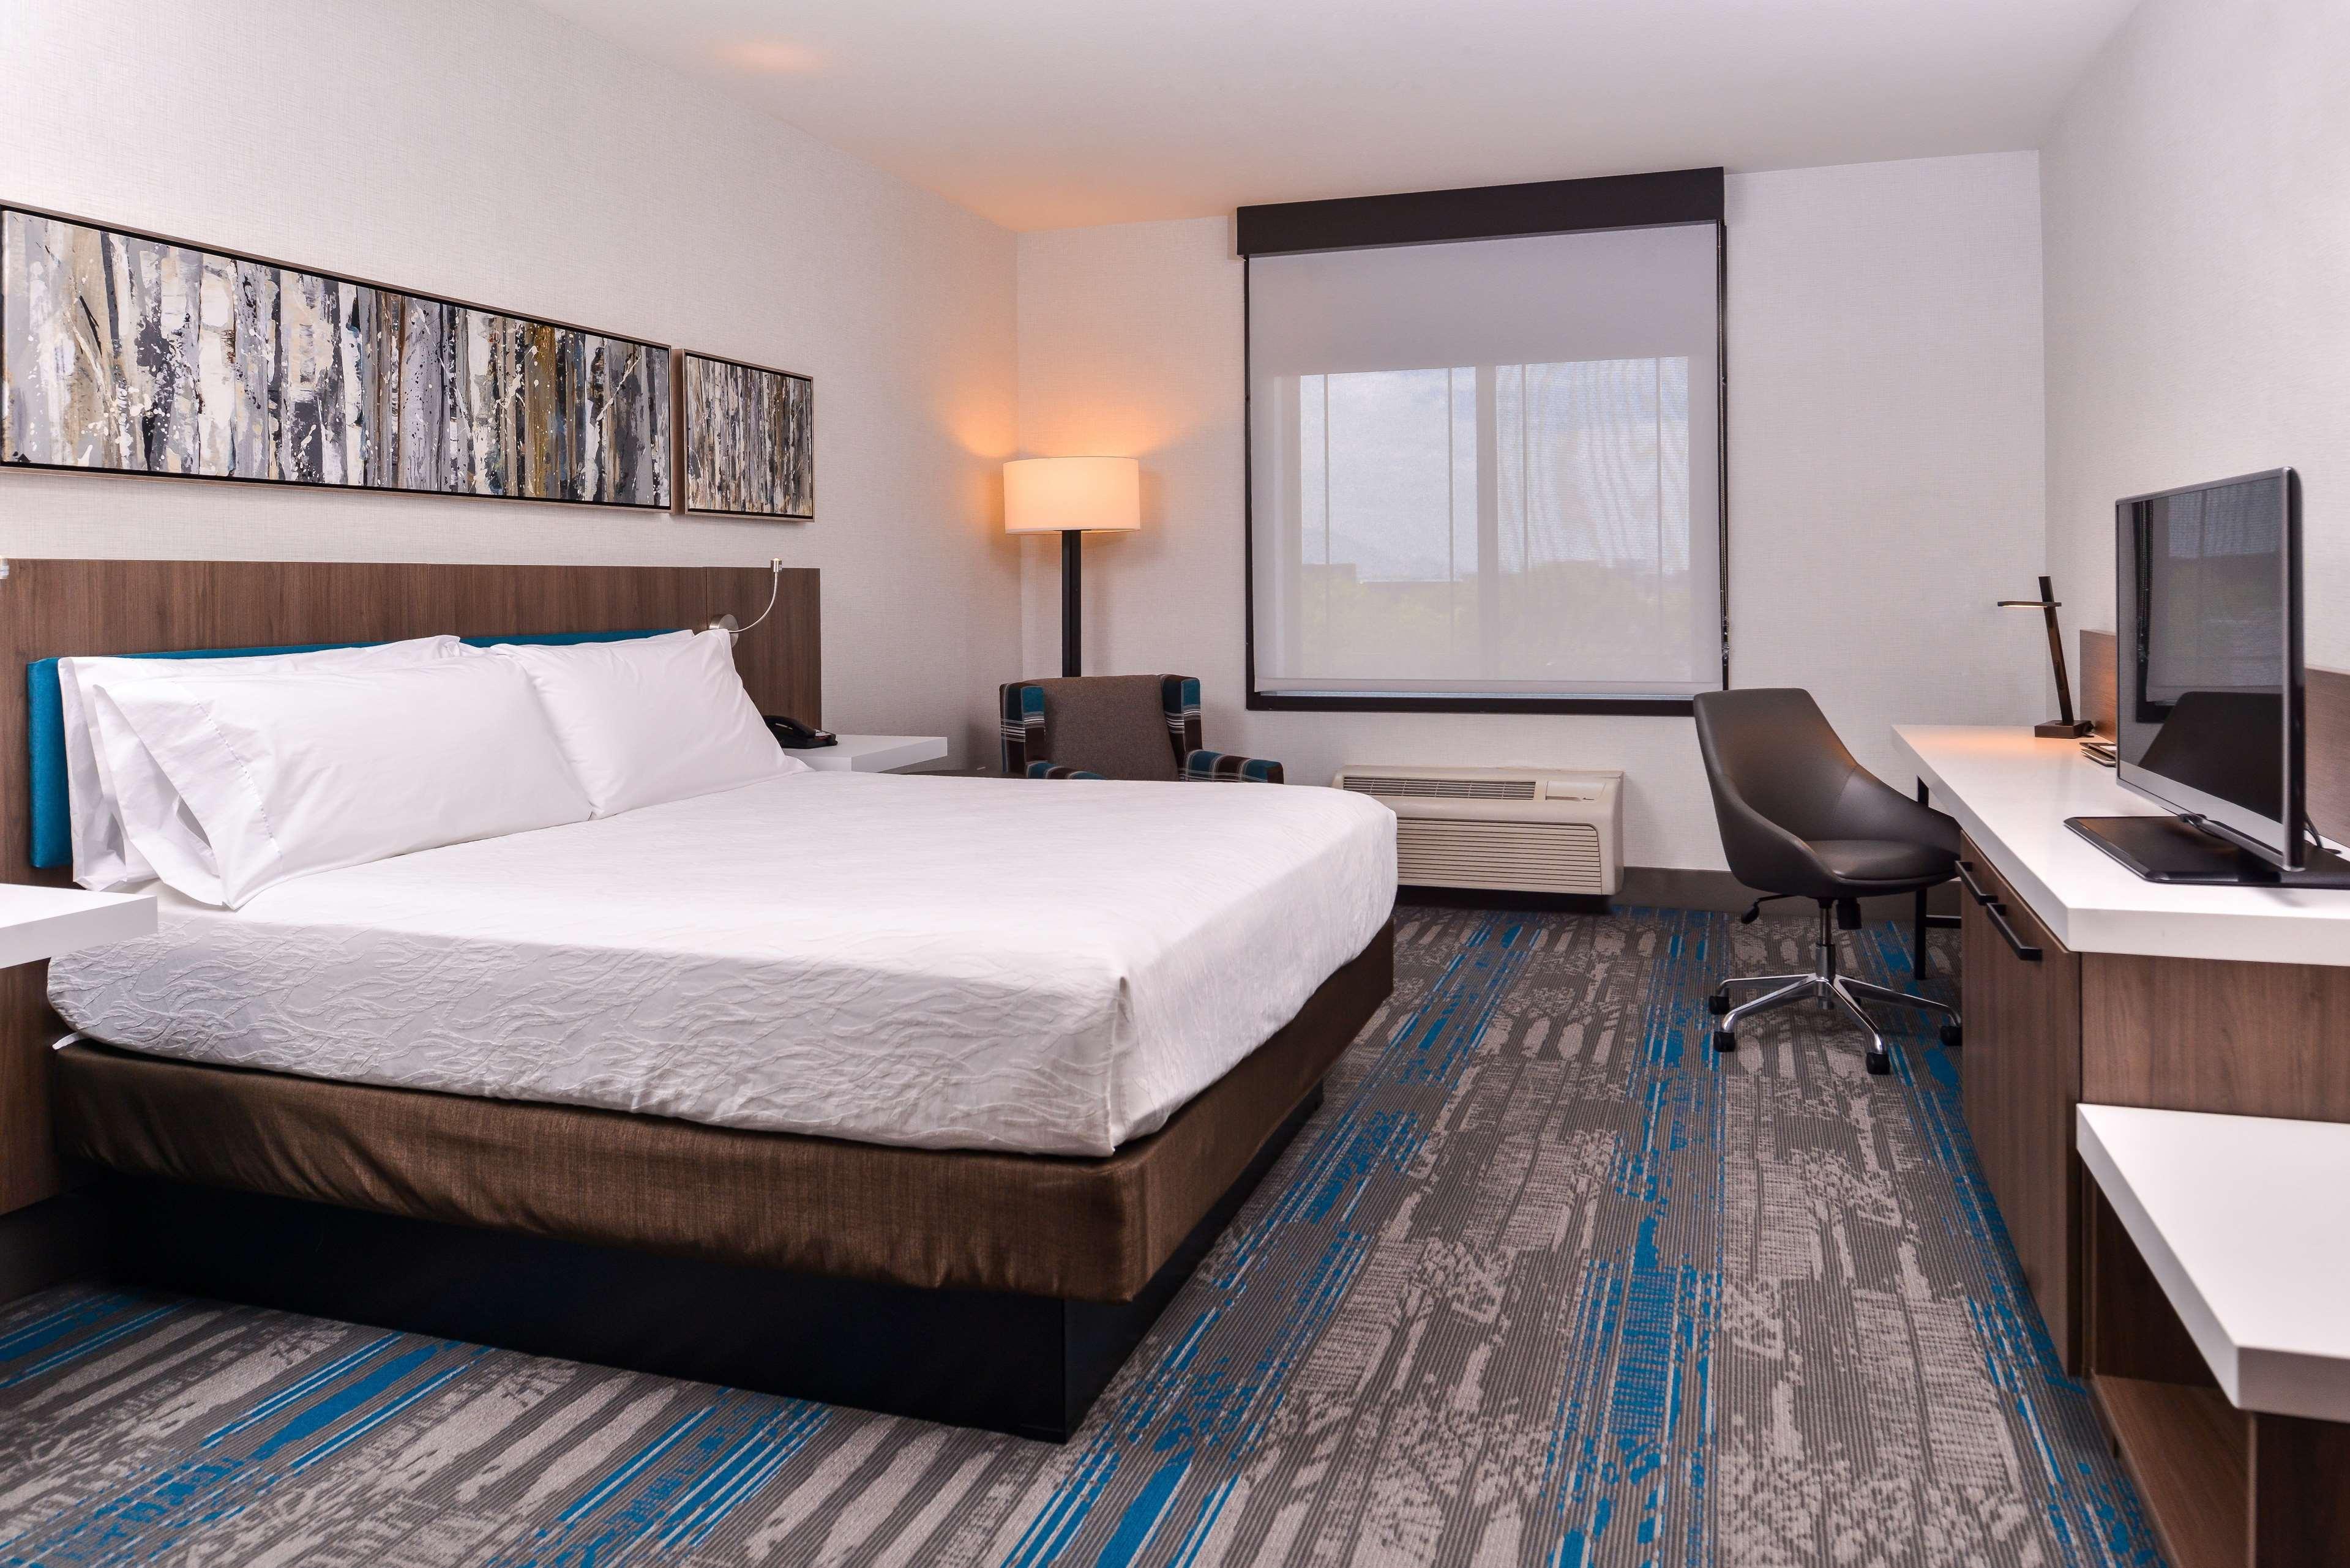 Hilton Garden Inn Salt Lake City Downtown image 28